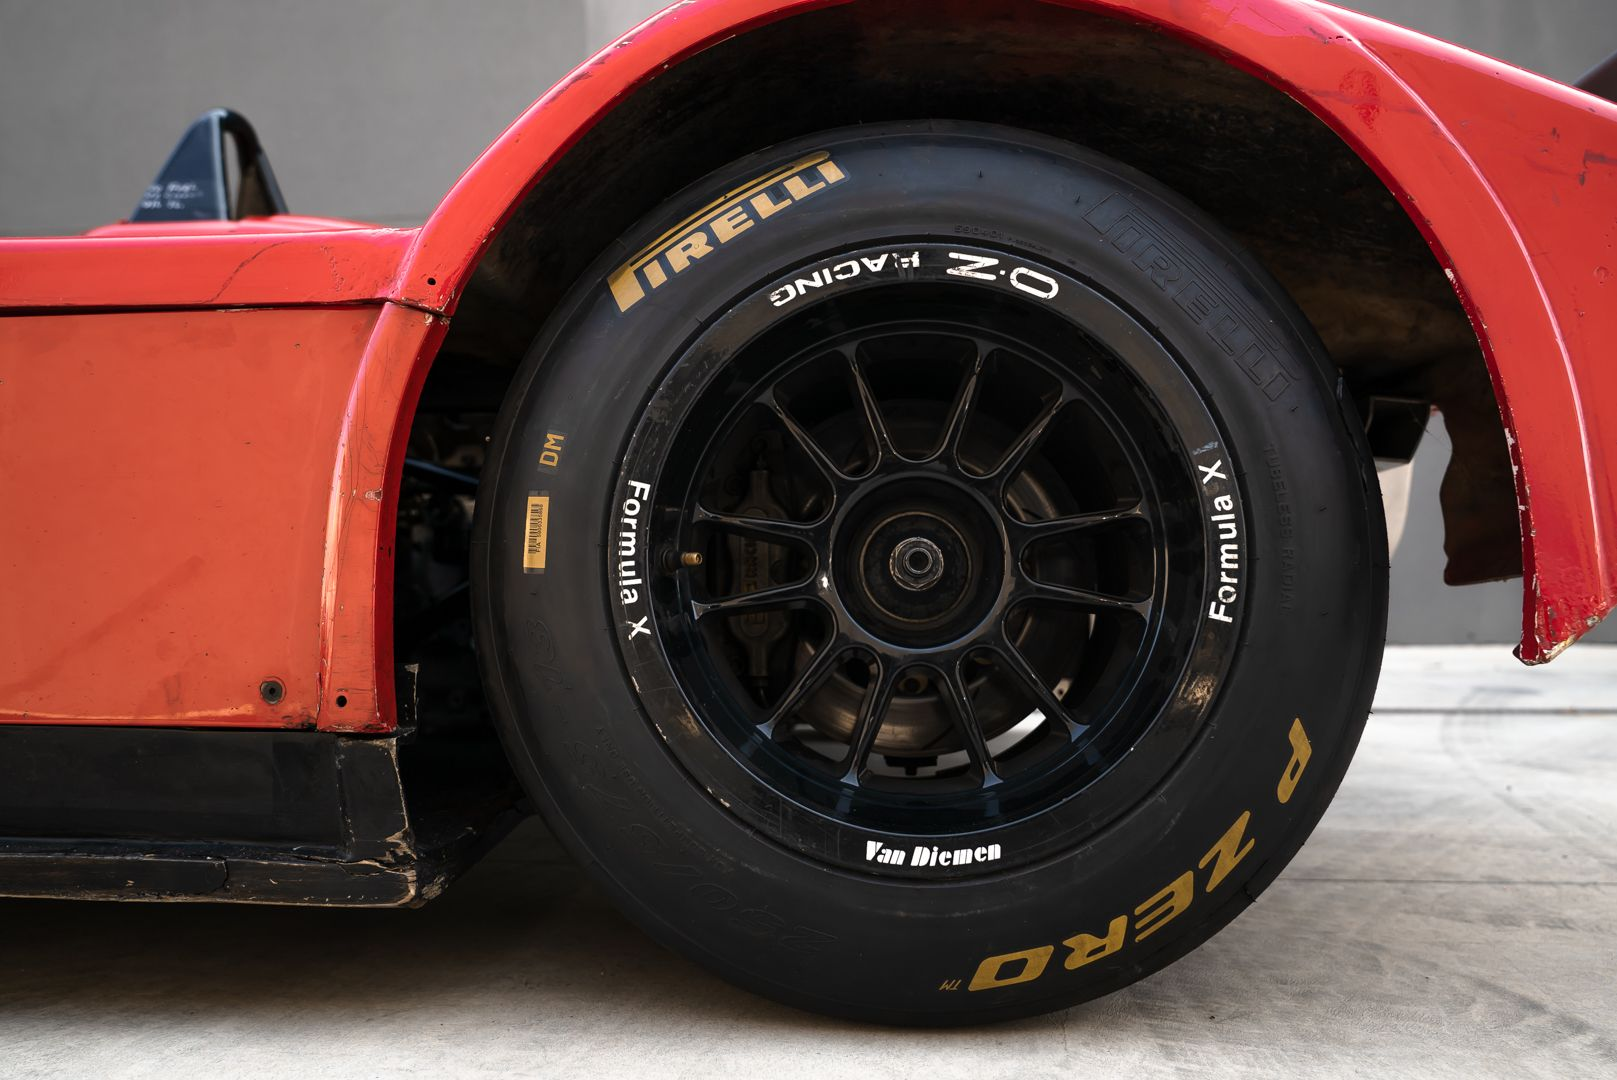 2004 Van Diemen Formula X RF04 CFX 68834